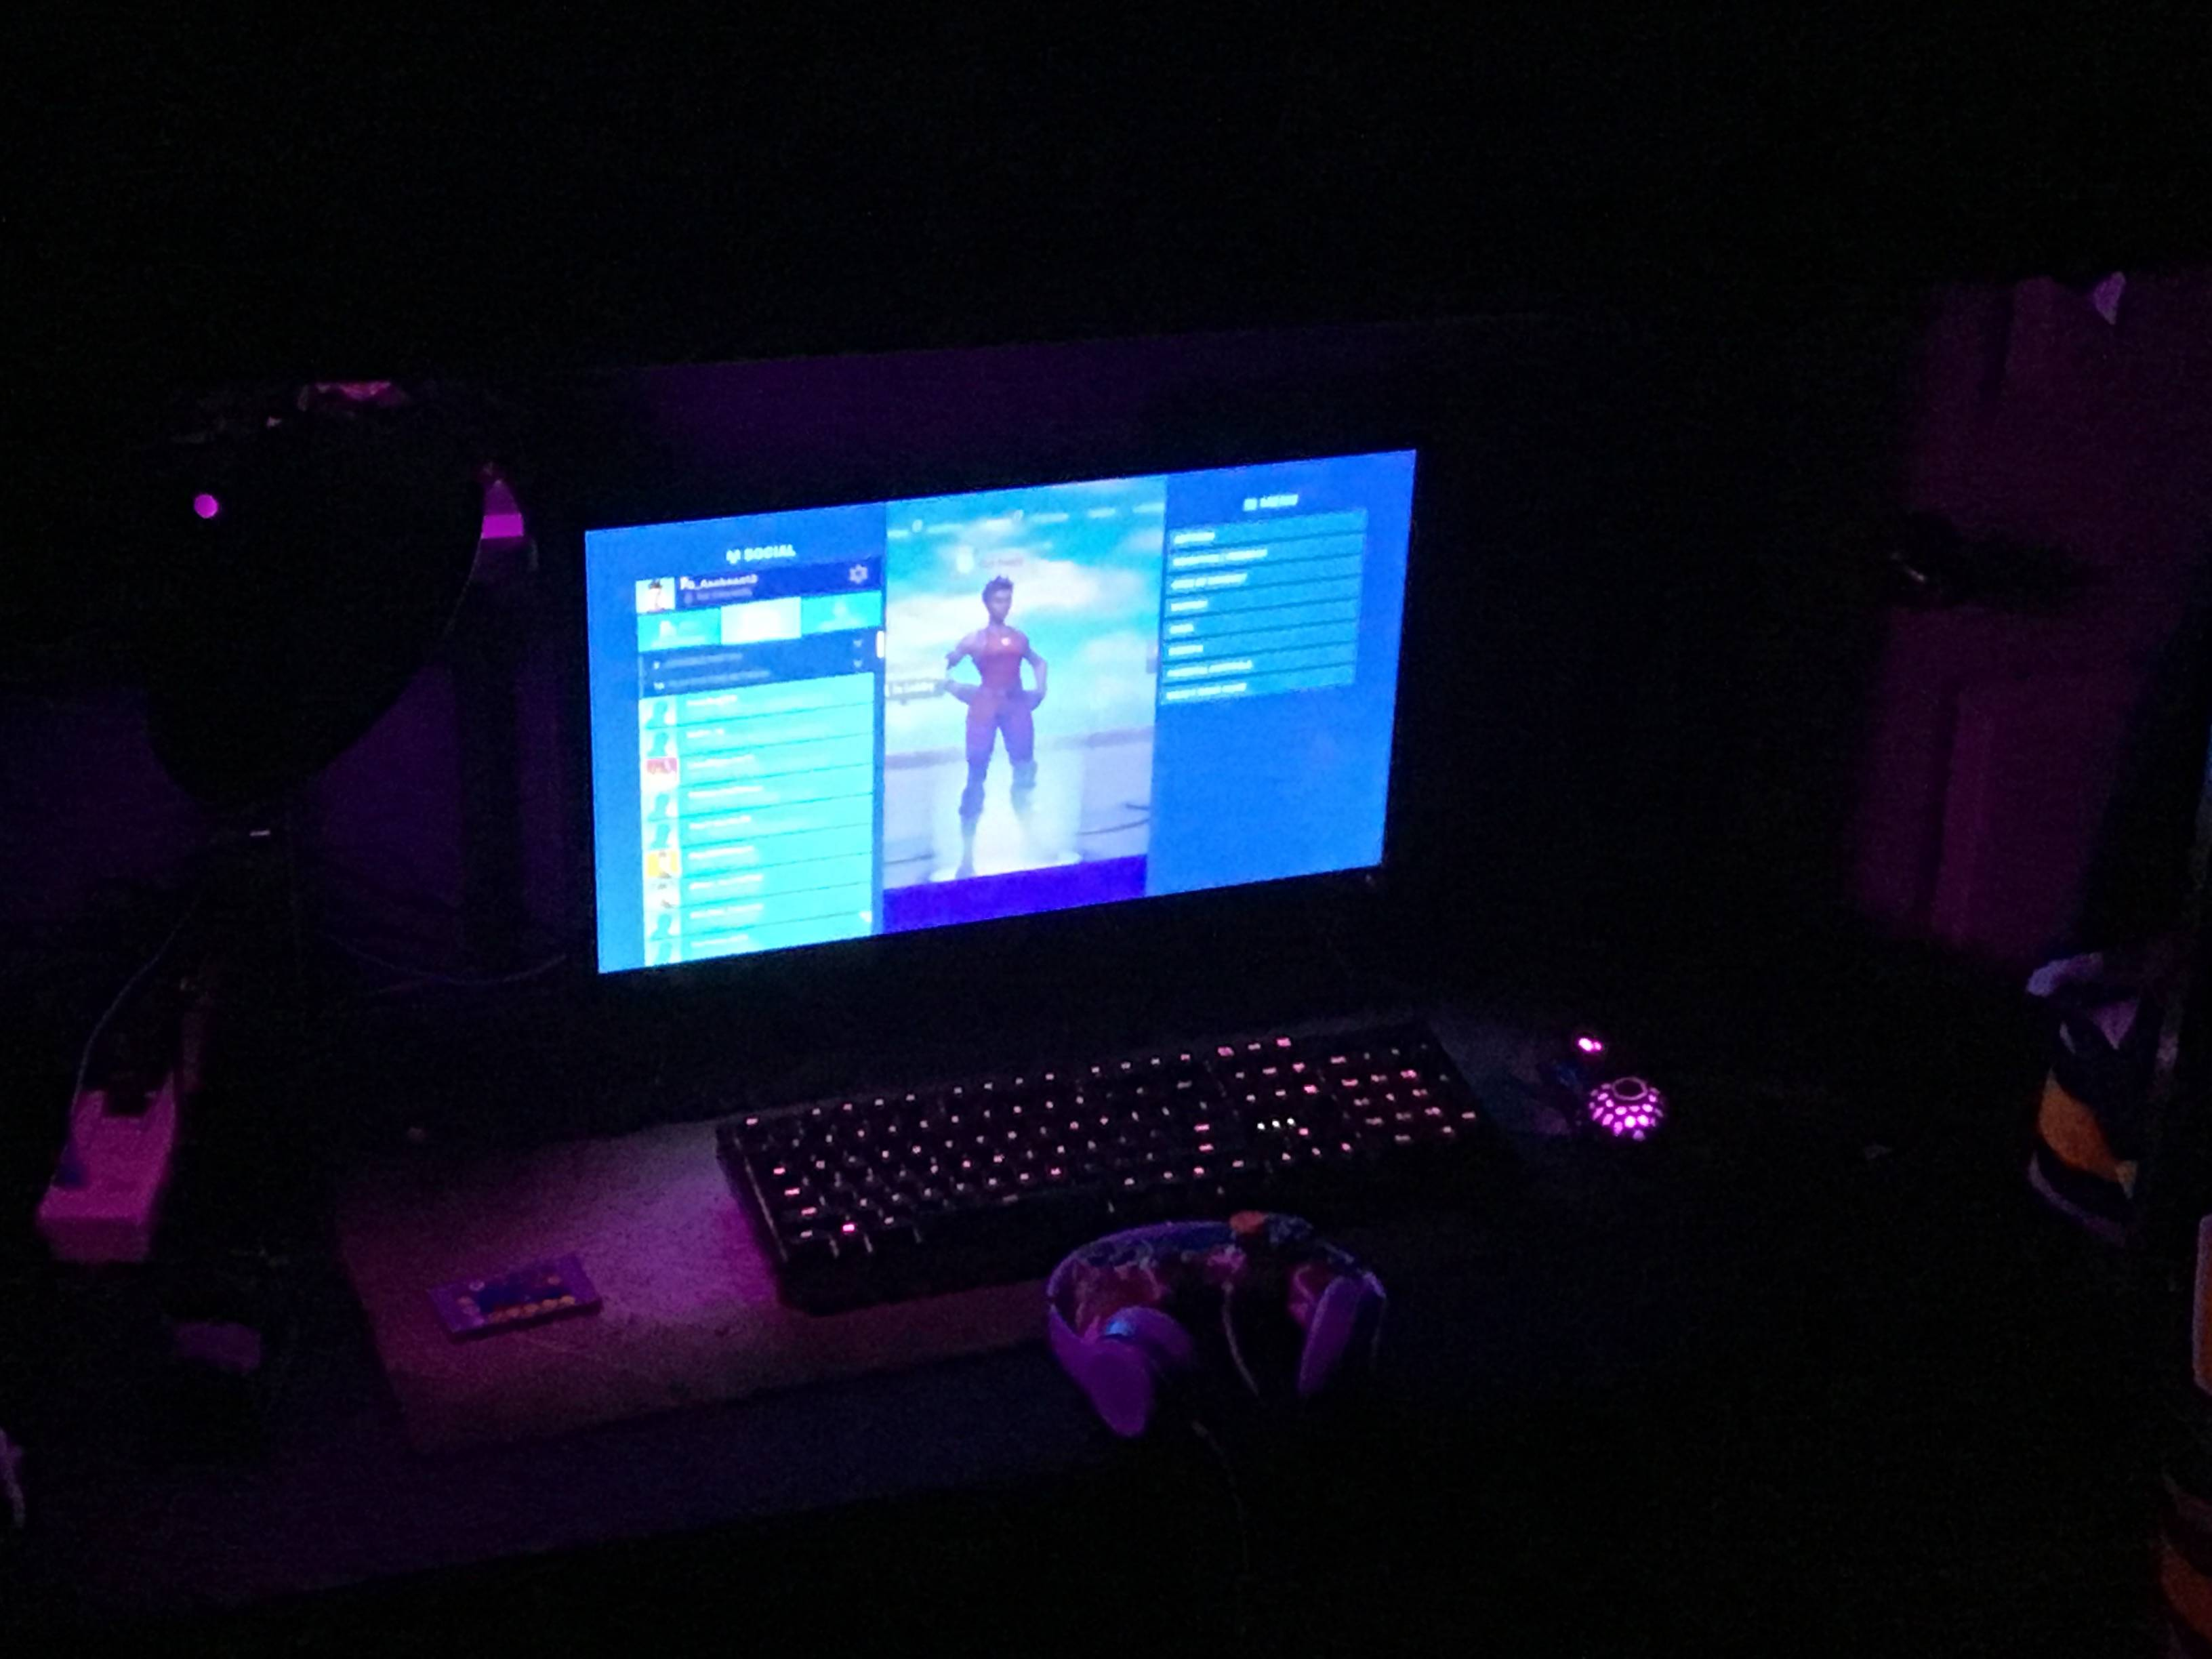 Asabean13's Setup - Console gaming setup | Scooget